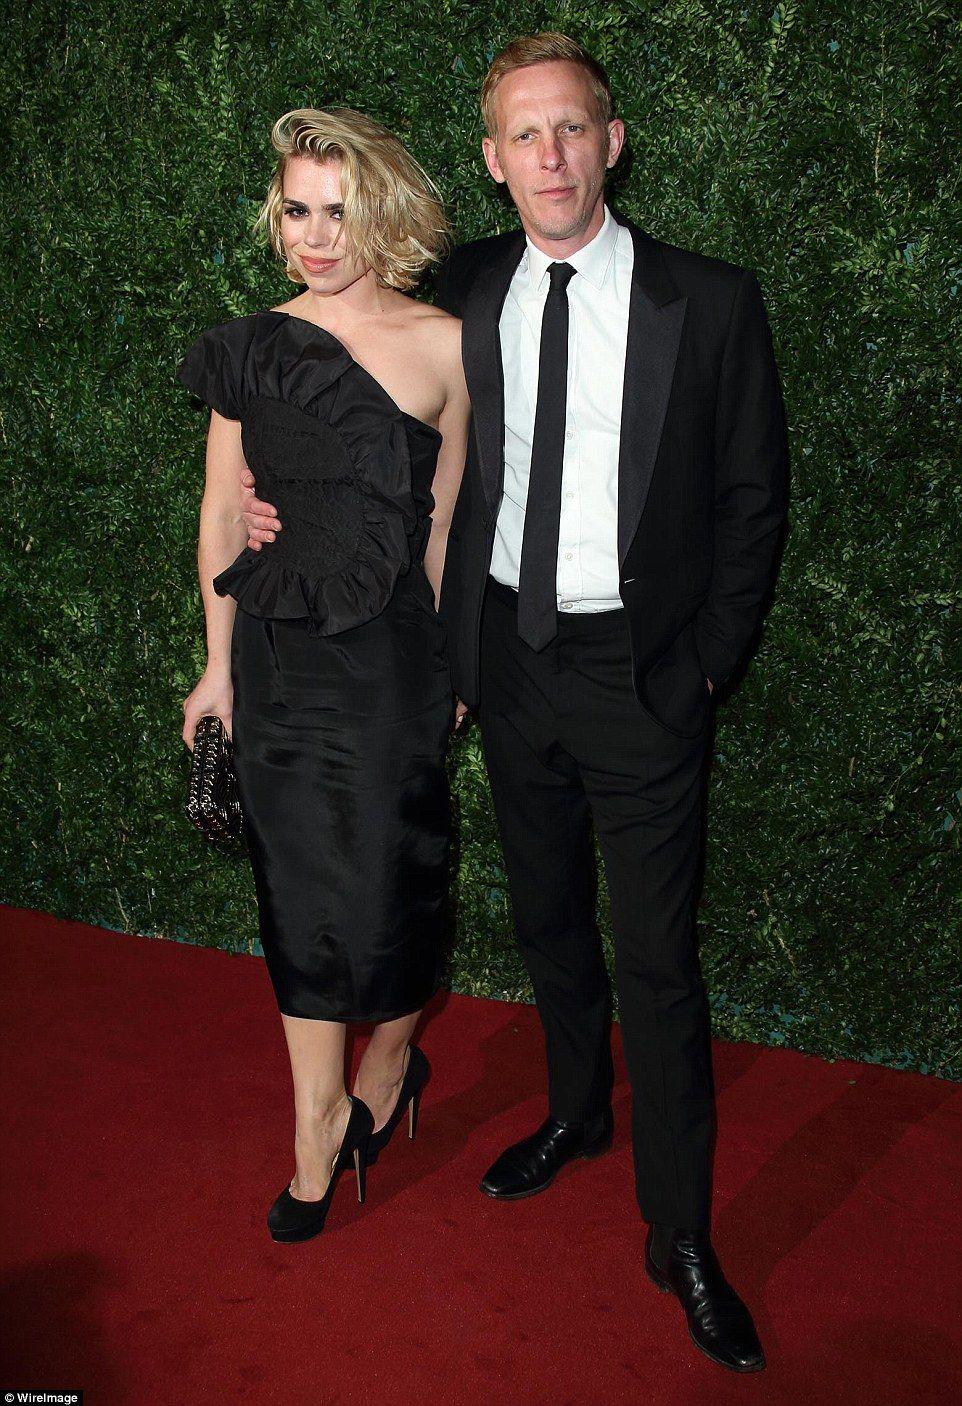 David Beckham holds wife Victoria's hand at Evening